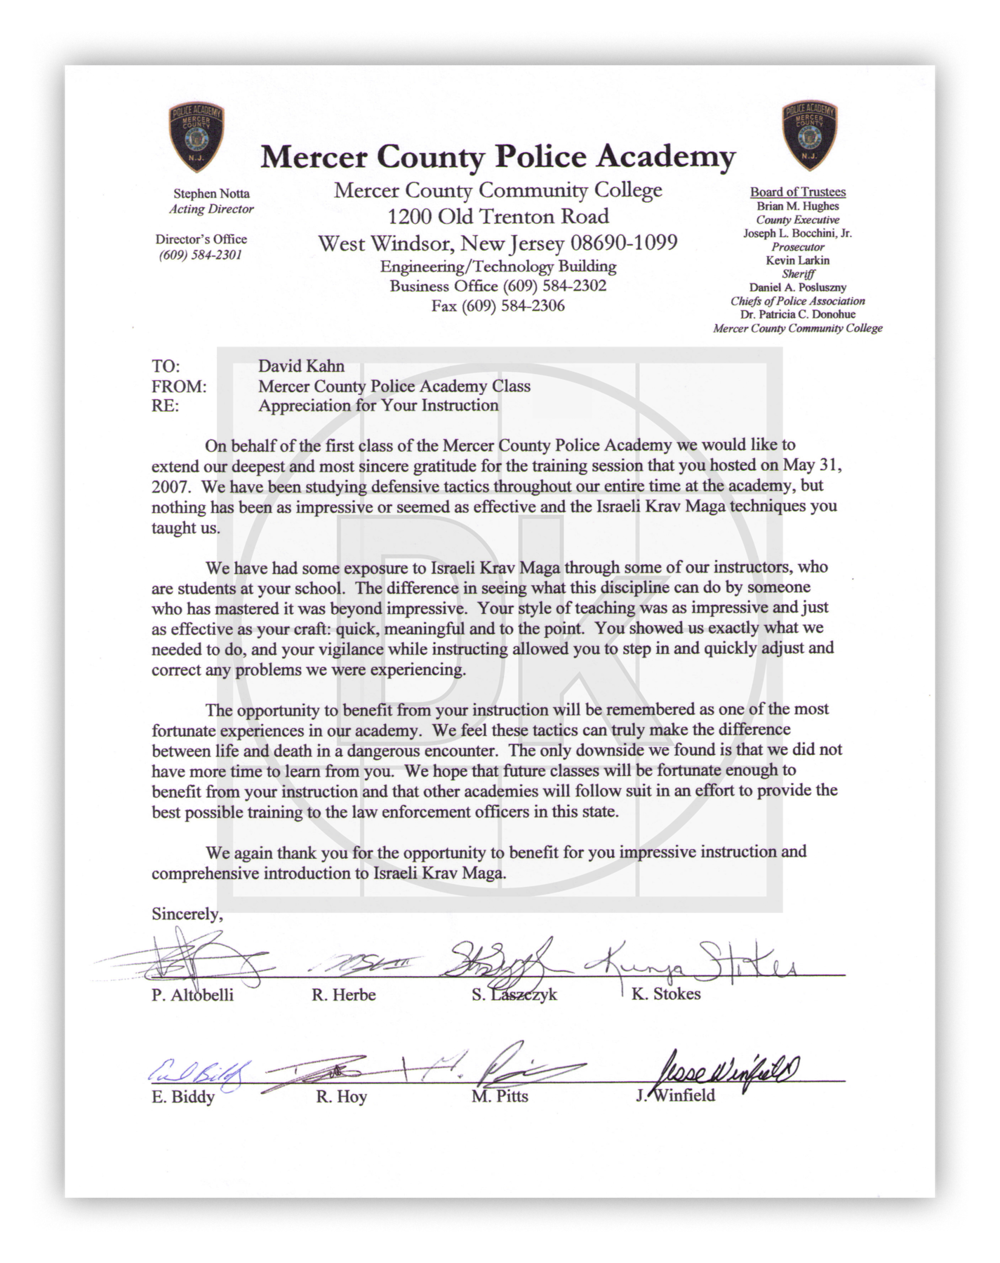 Mercer County Police Academy